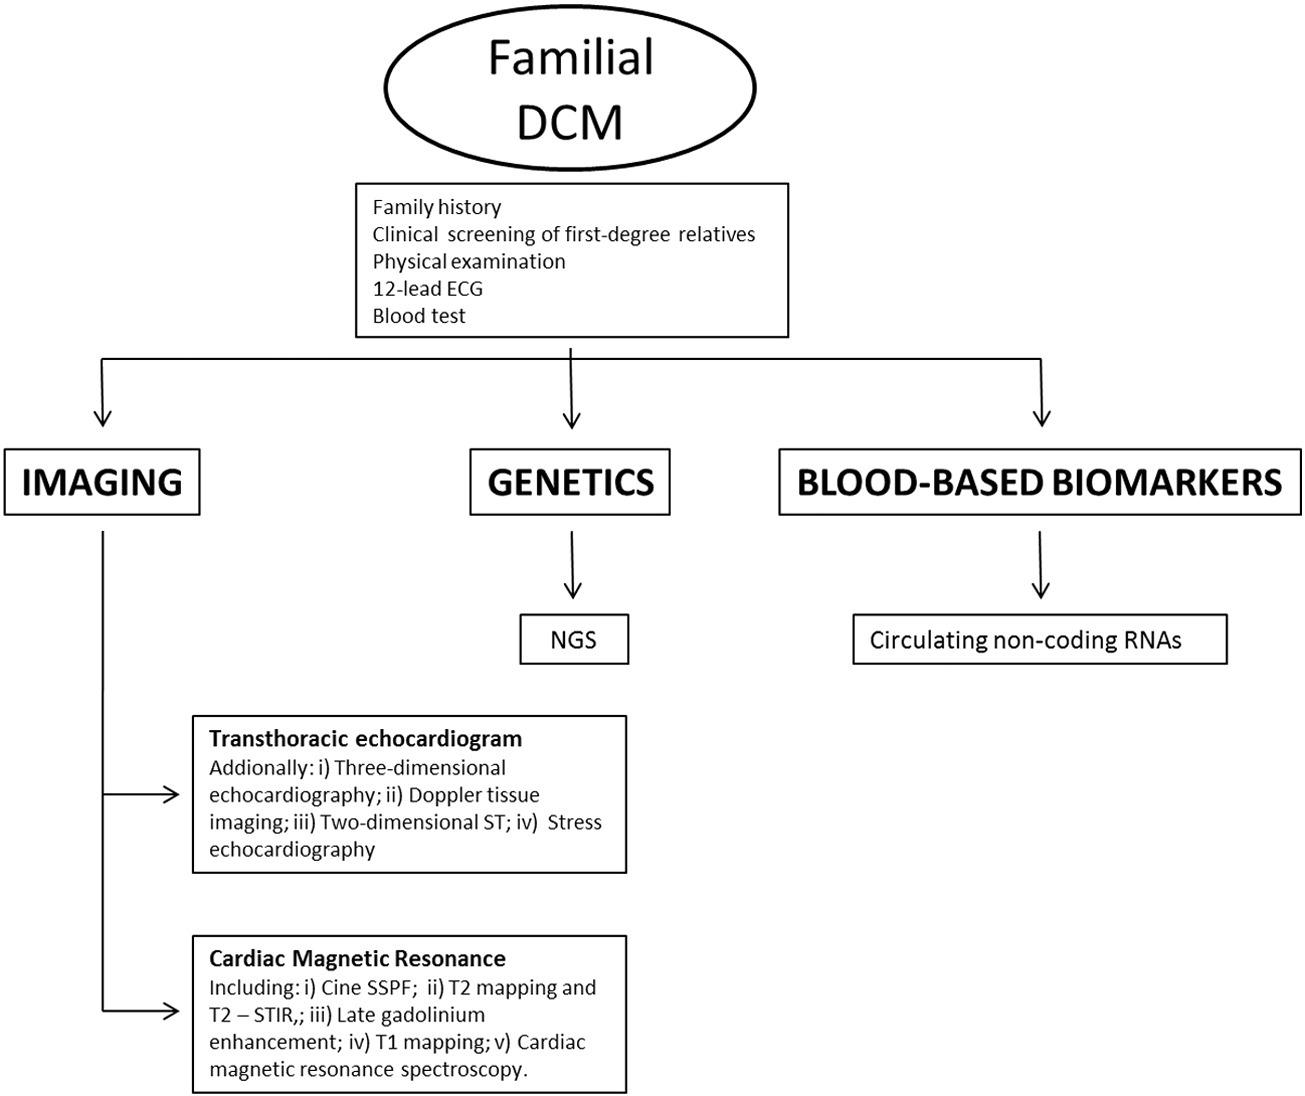 Familial Dilated Cardiomyopathy A Multidisciplinary